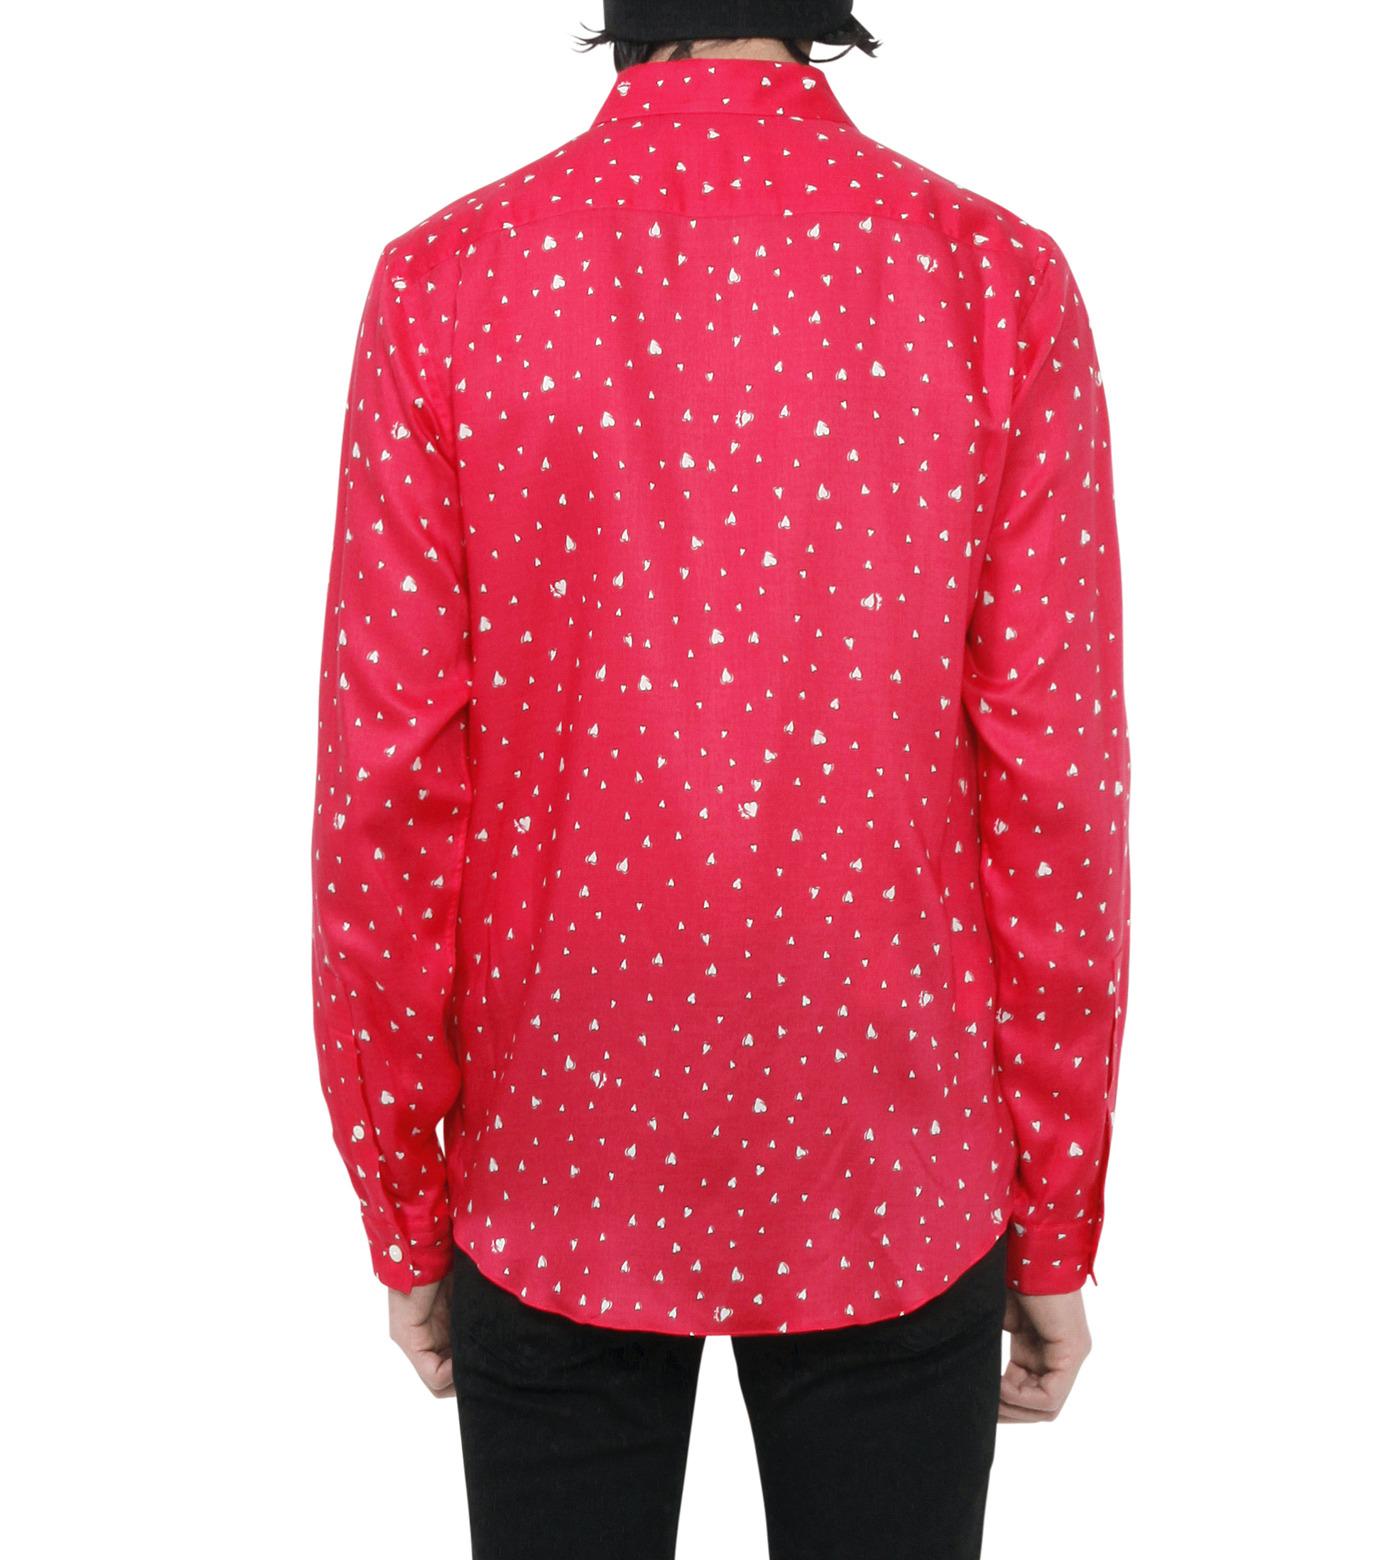 HL HEDDIE LOVU(エイチエル・エディールーヴ)のHEART PATTERN SHIRT-PINK(シャツ/shirt)-18S93001-72 拡大詳細画像4